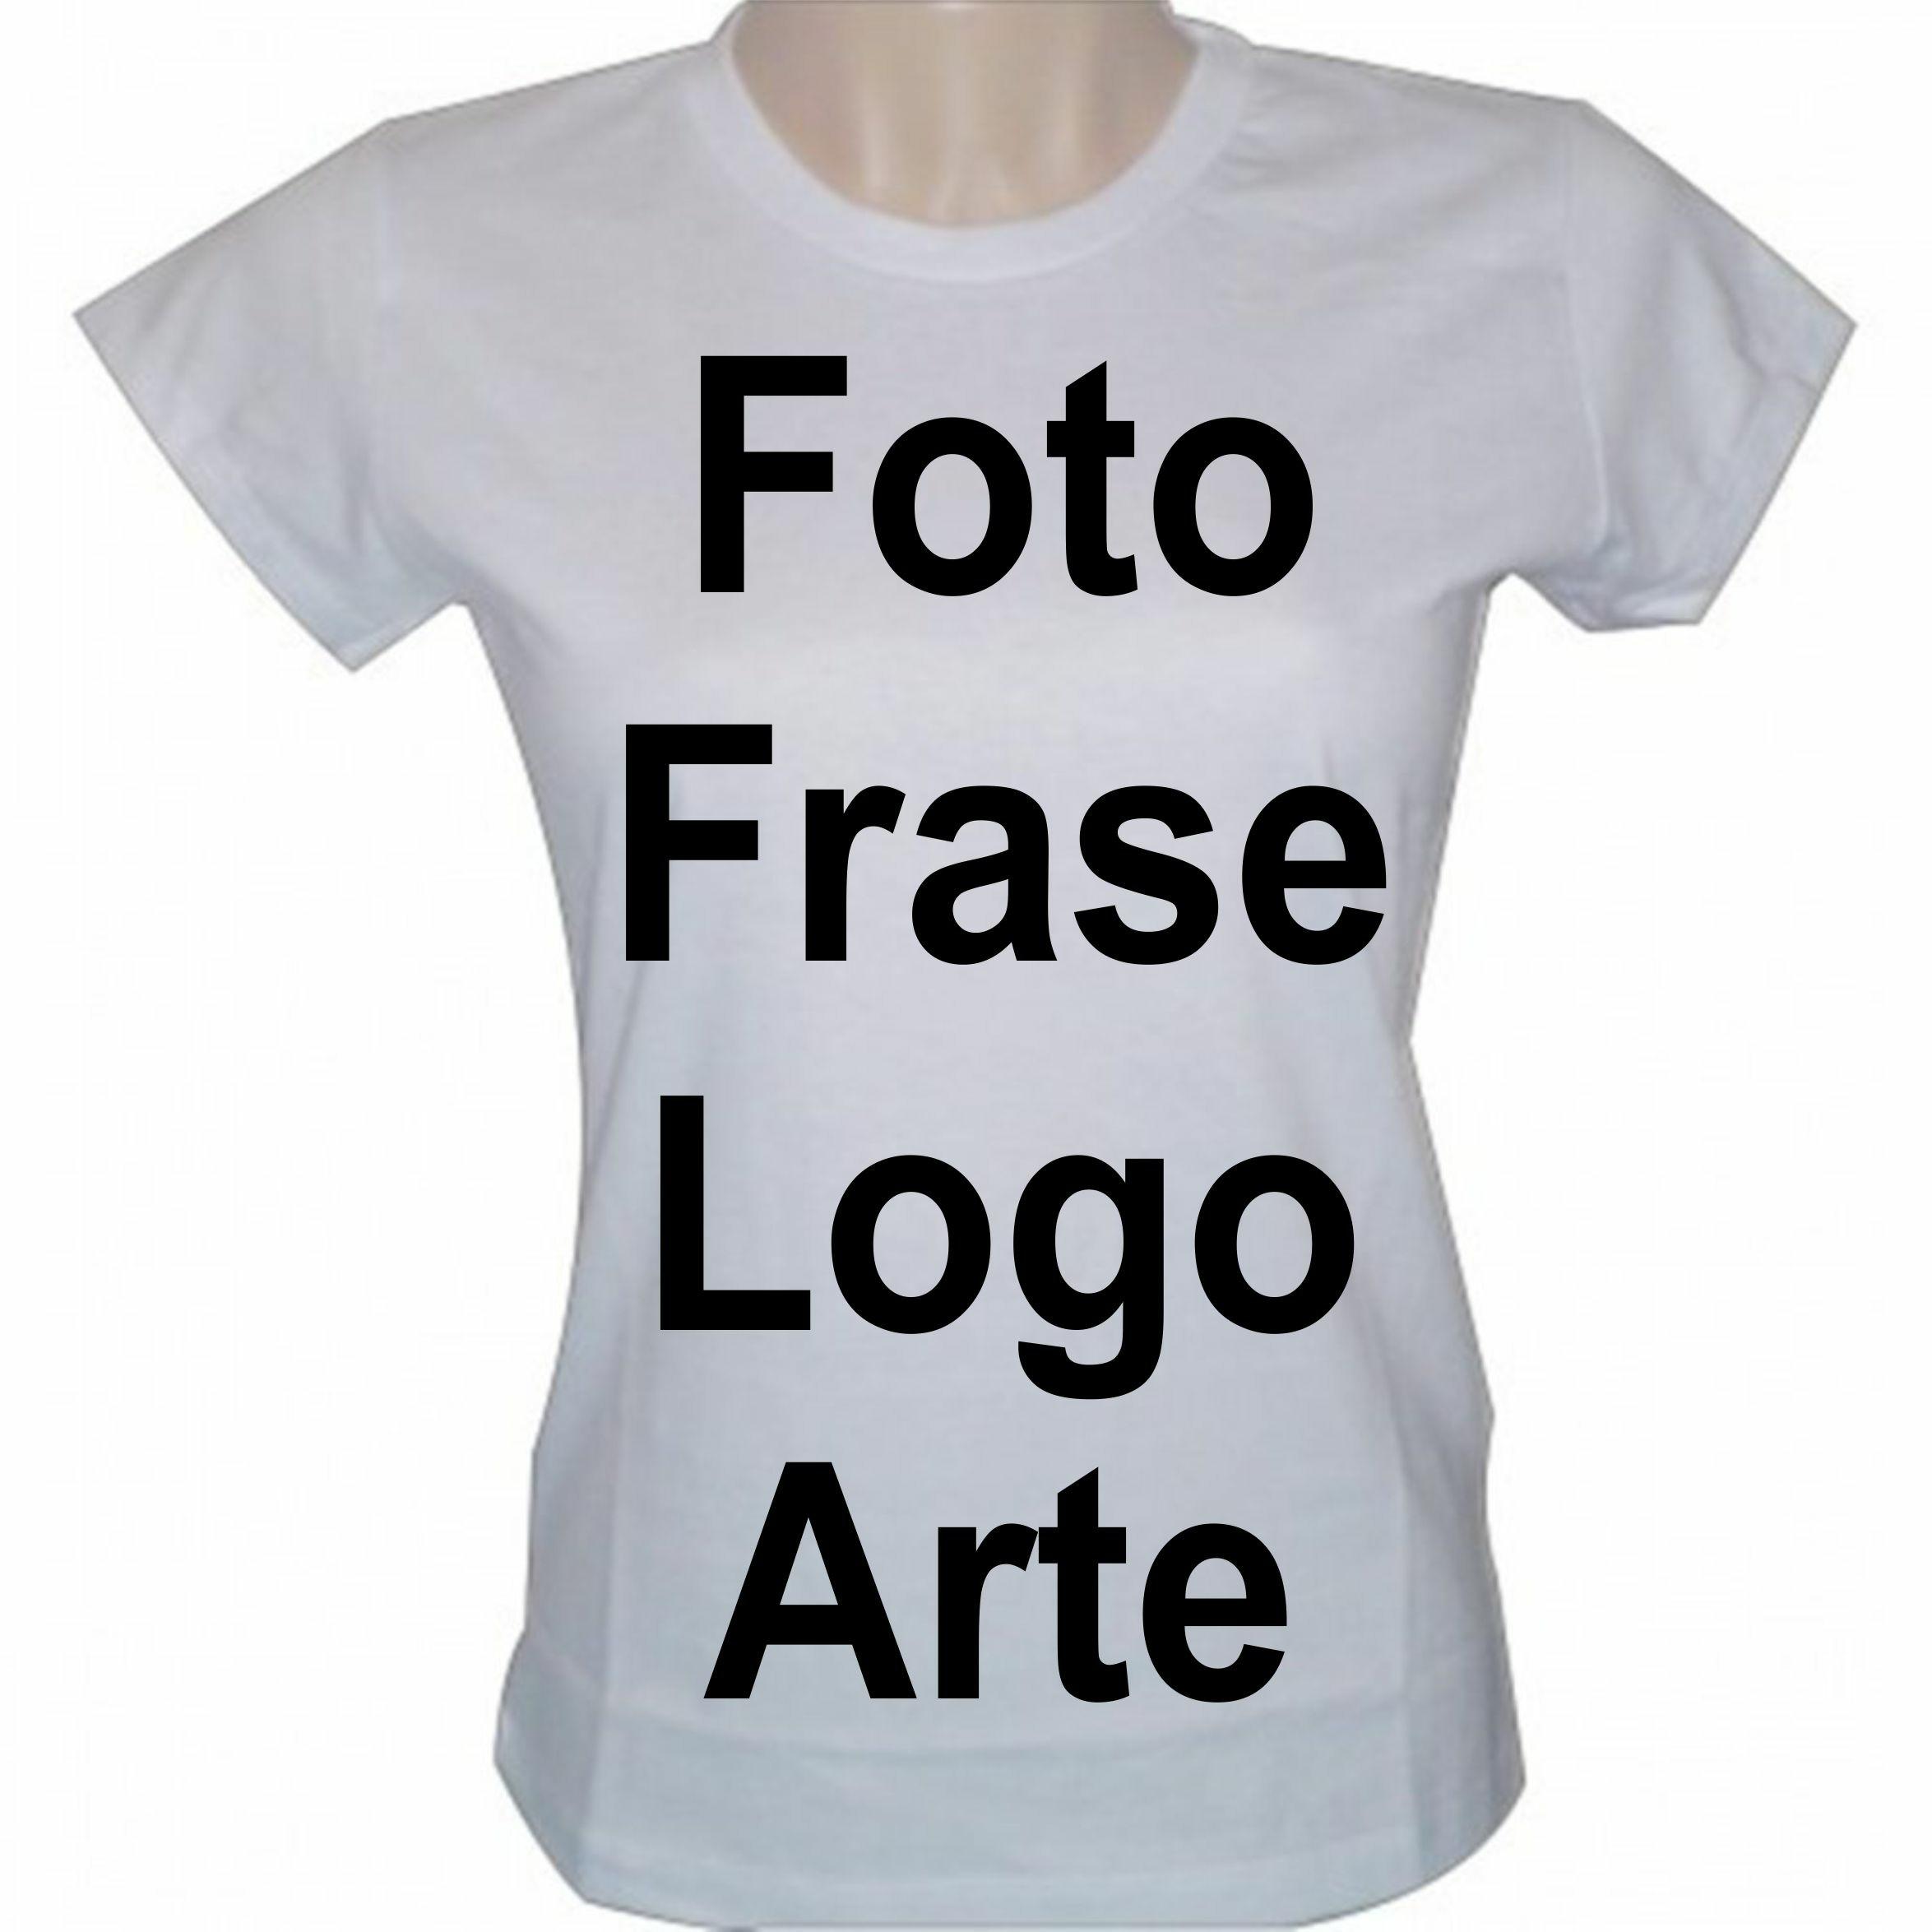 46aae1a4fc Camiseta Baby Look Personalizada